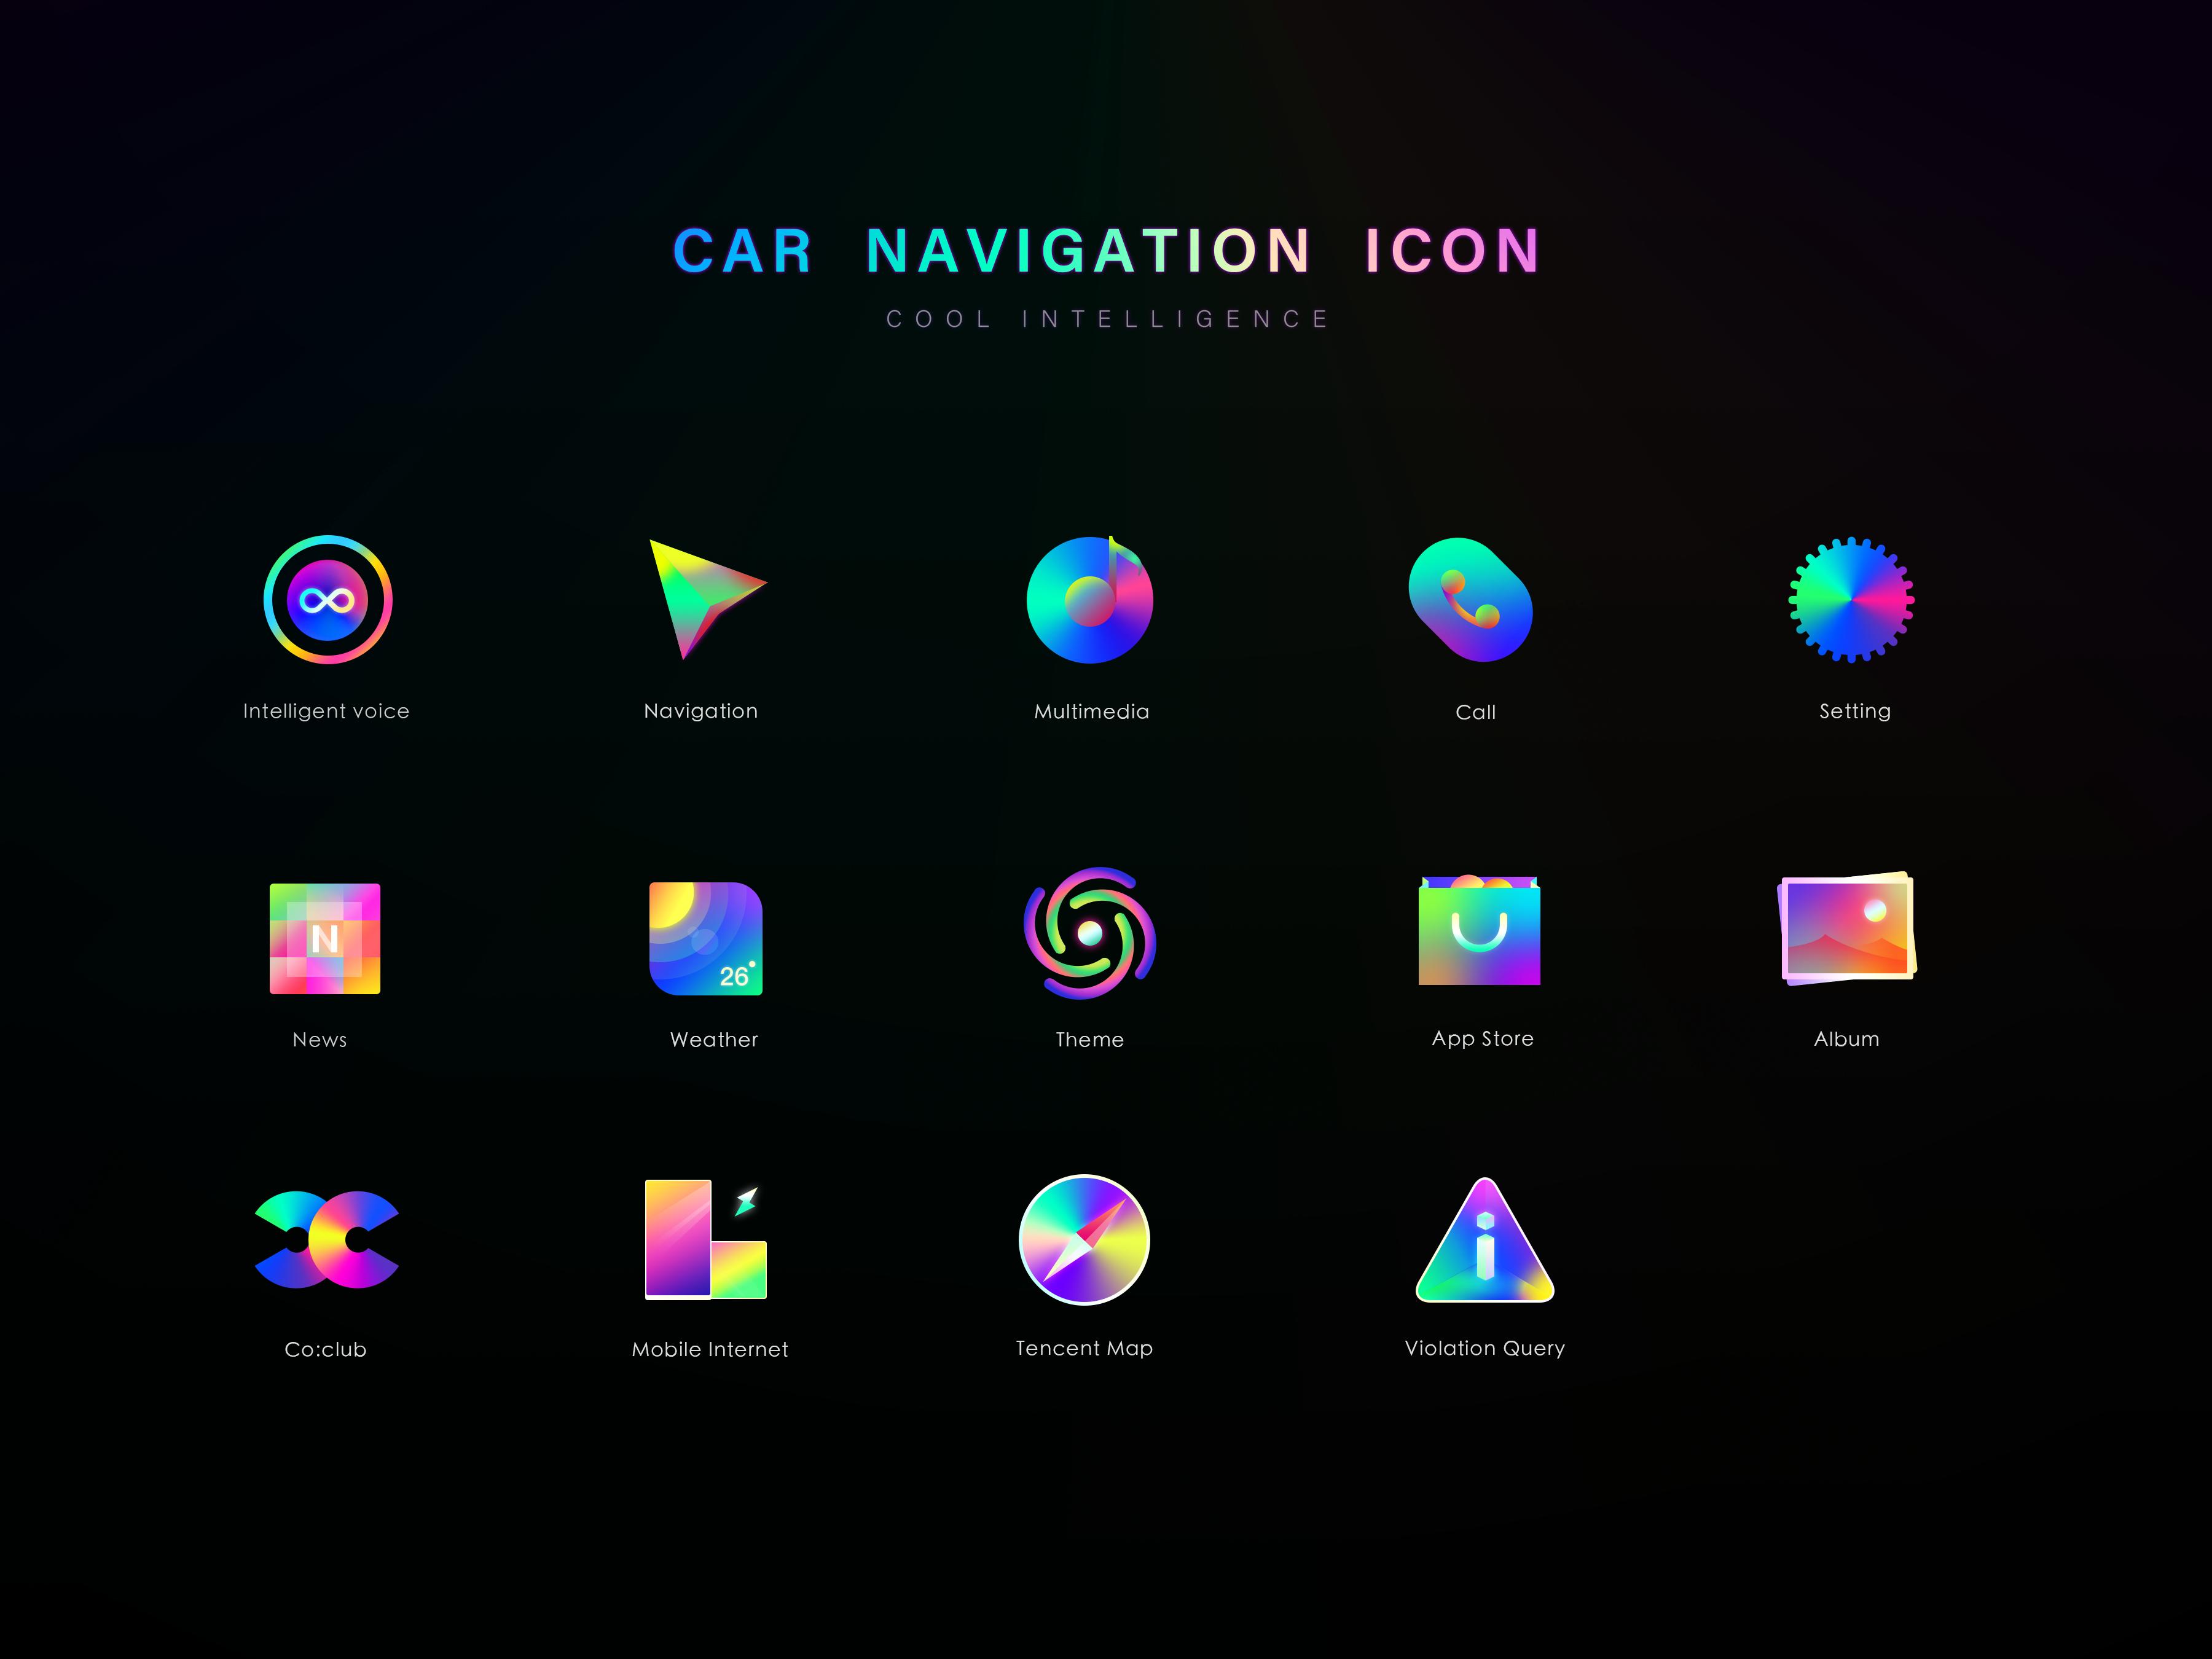 Car Navigation Icon Car Navigation Icon Set Design Icon